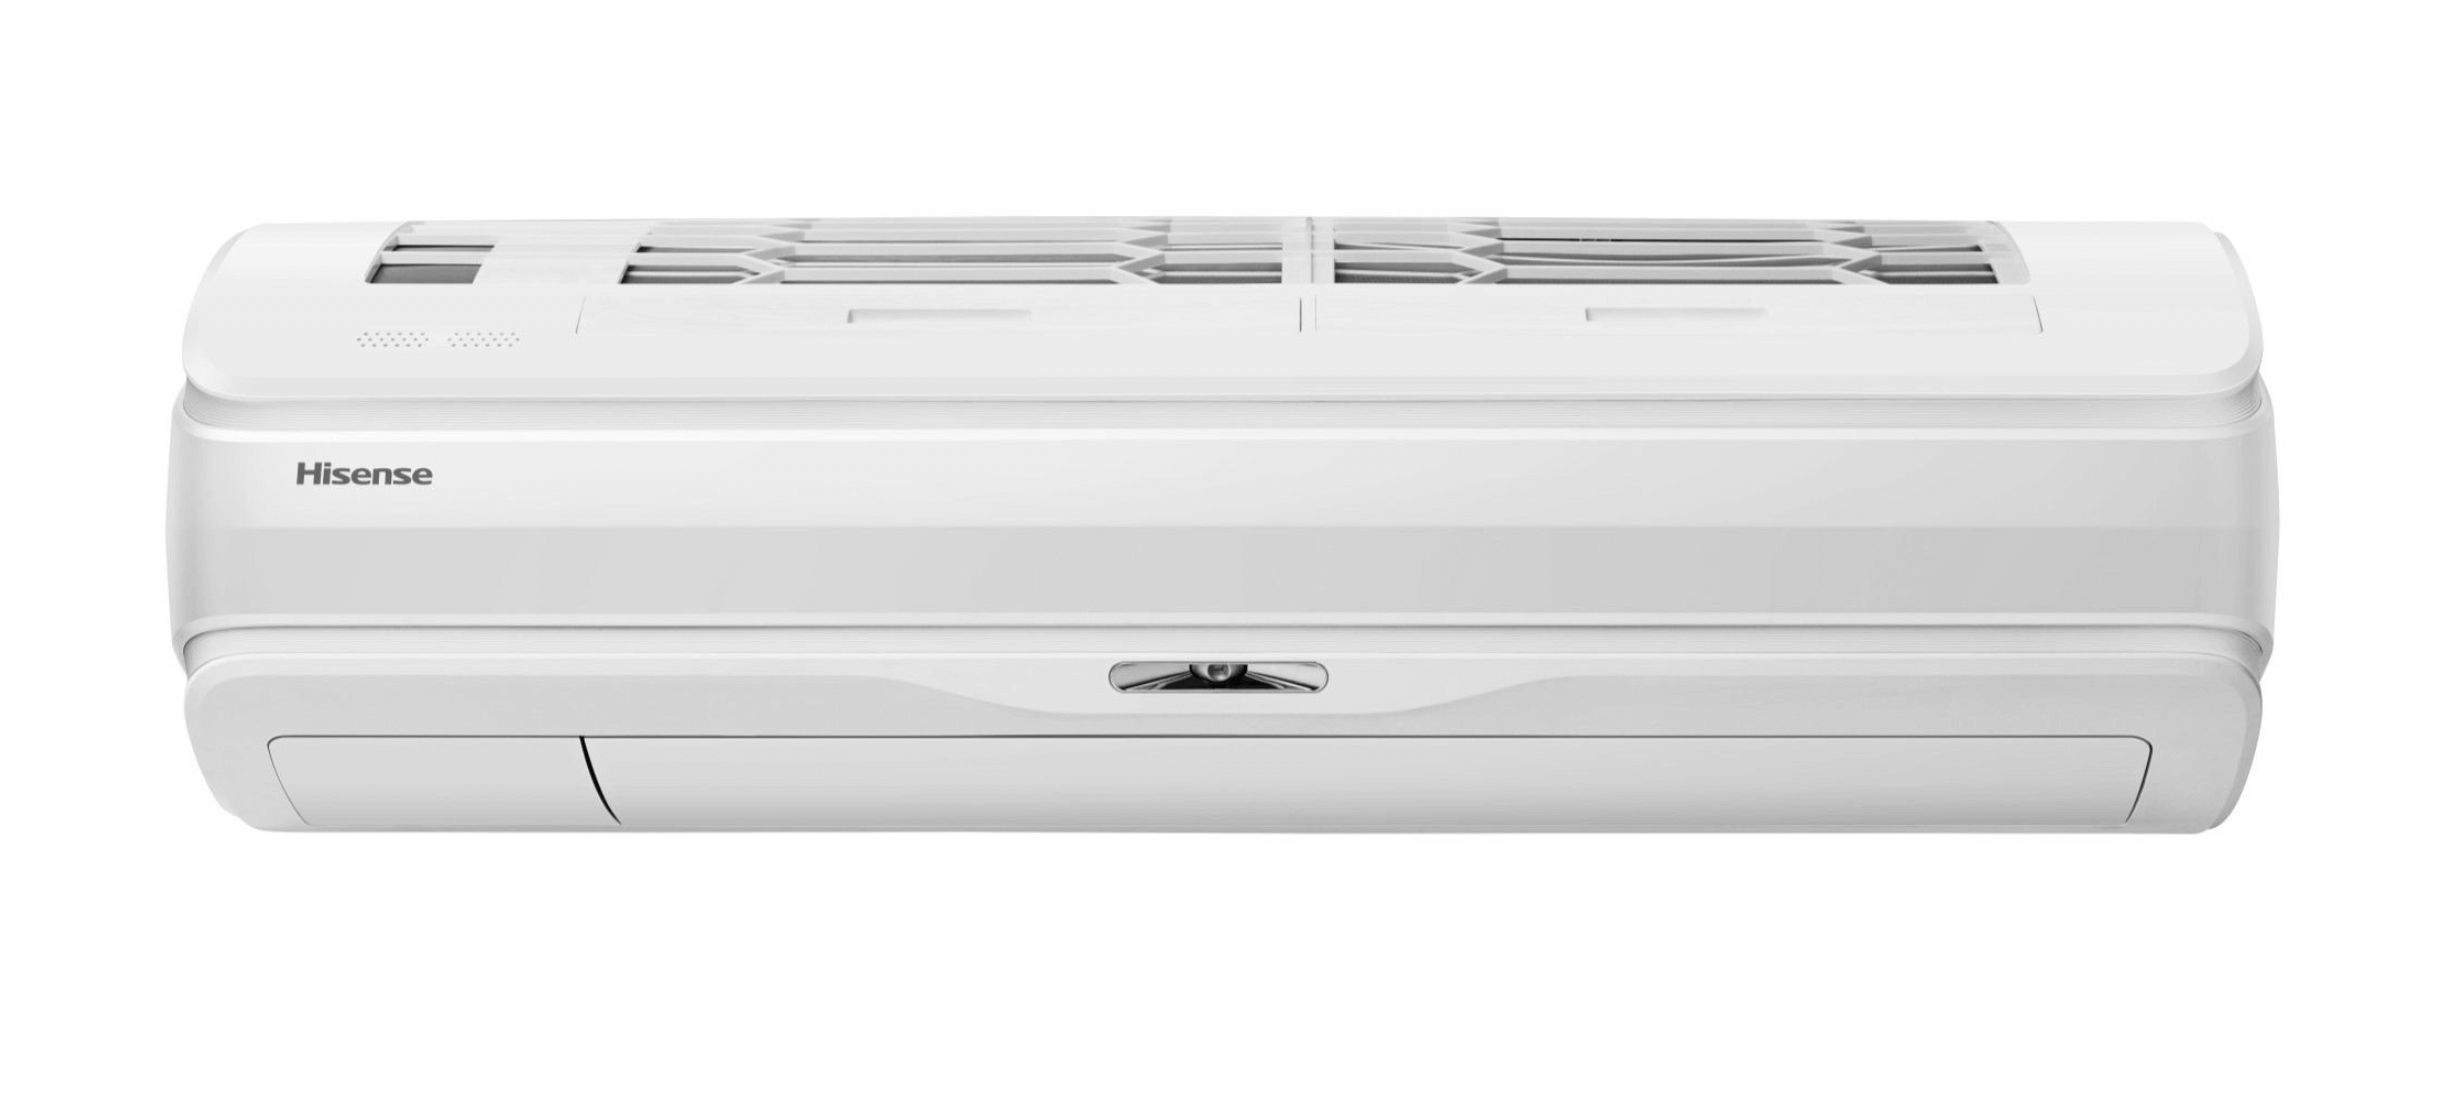 Hisense Silentium Pro 3.5 KW Set 001